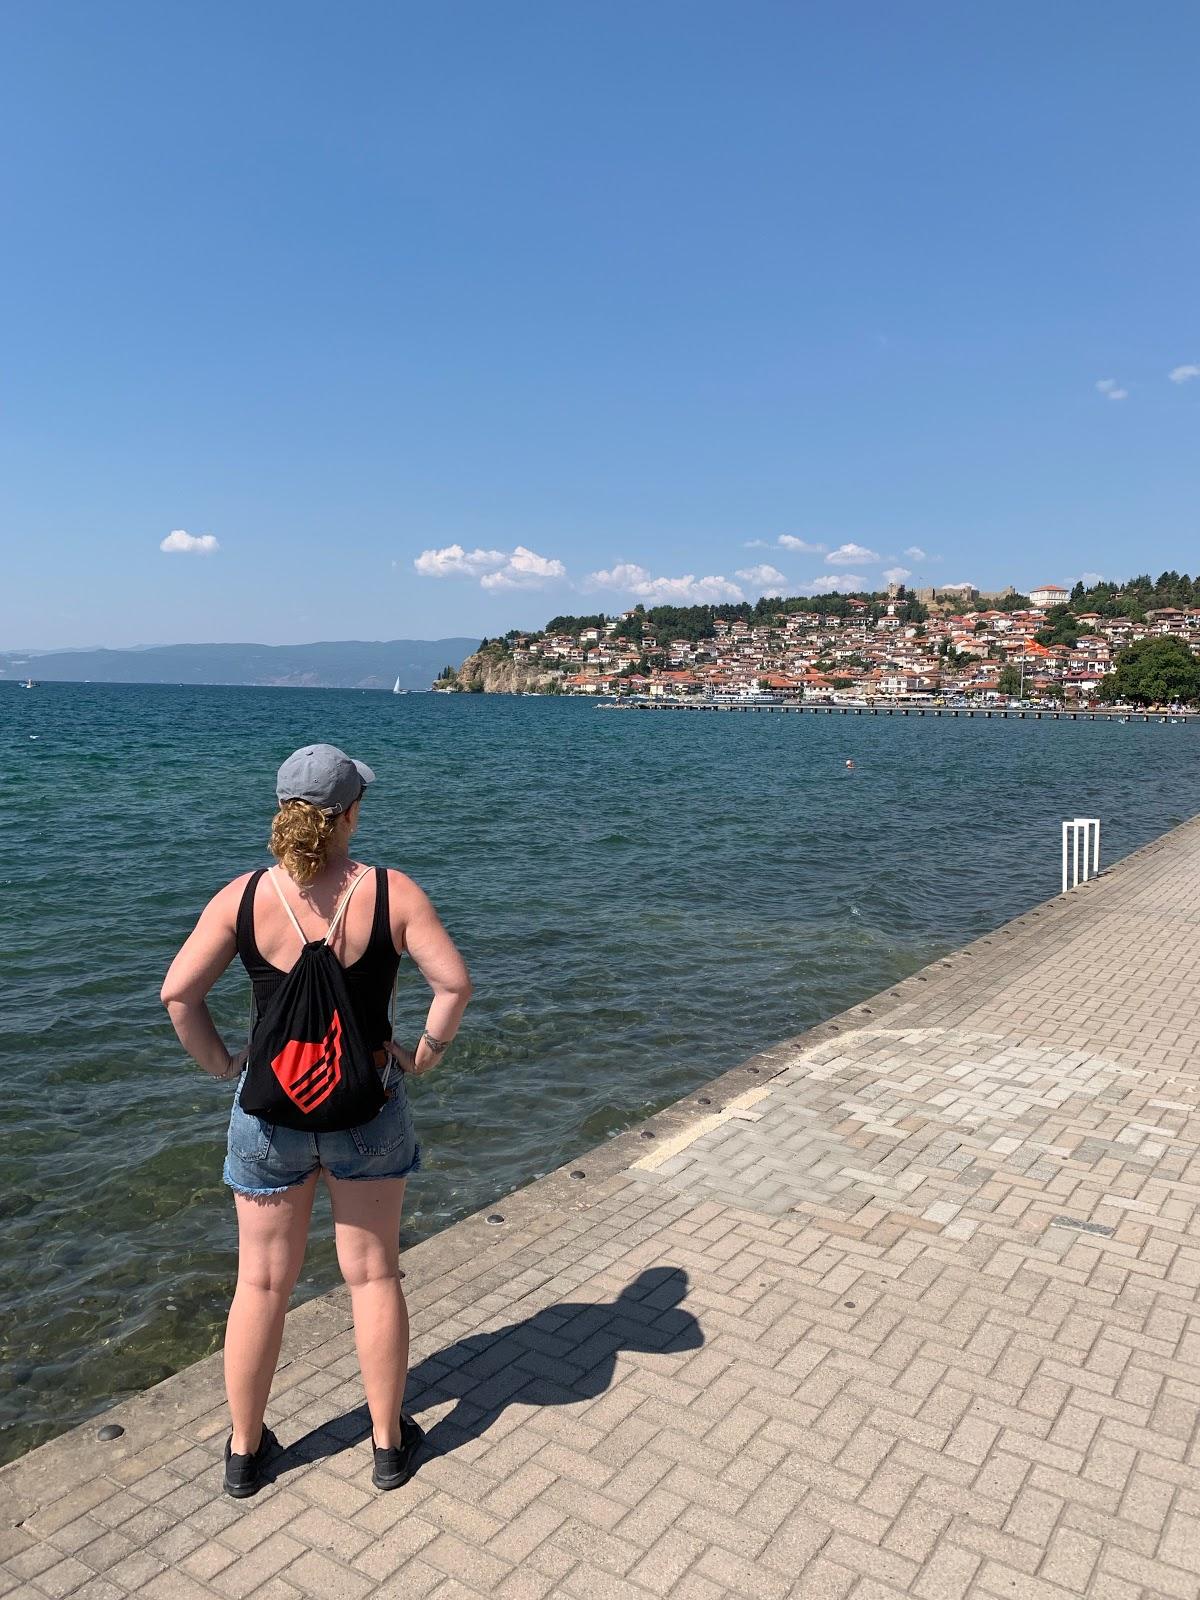 Monterail employee on sabbatical leave - Kasia in Macedonia.